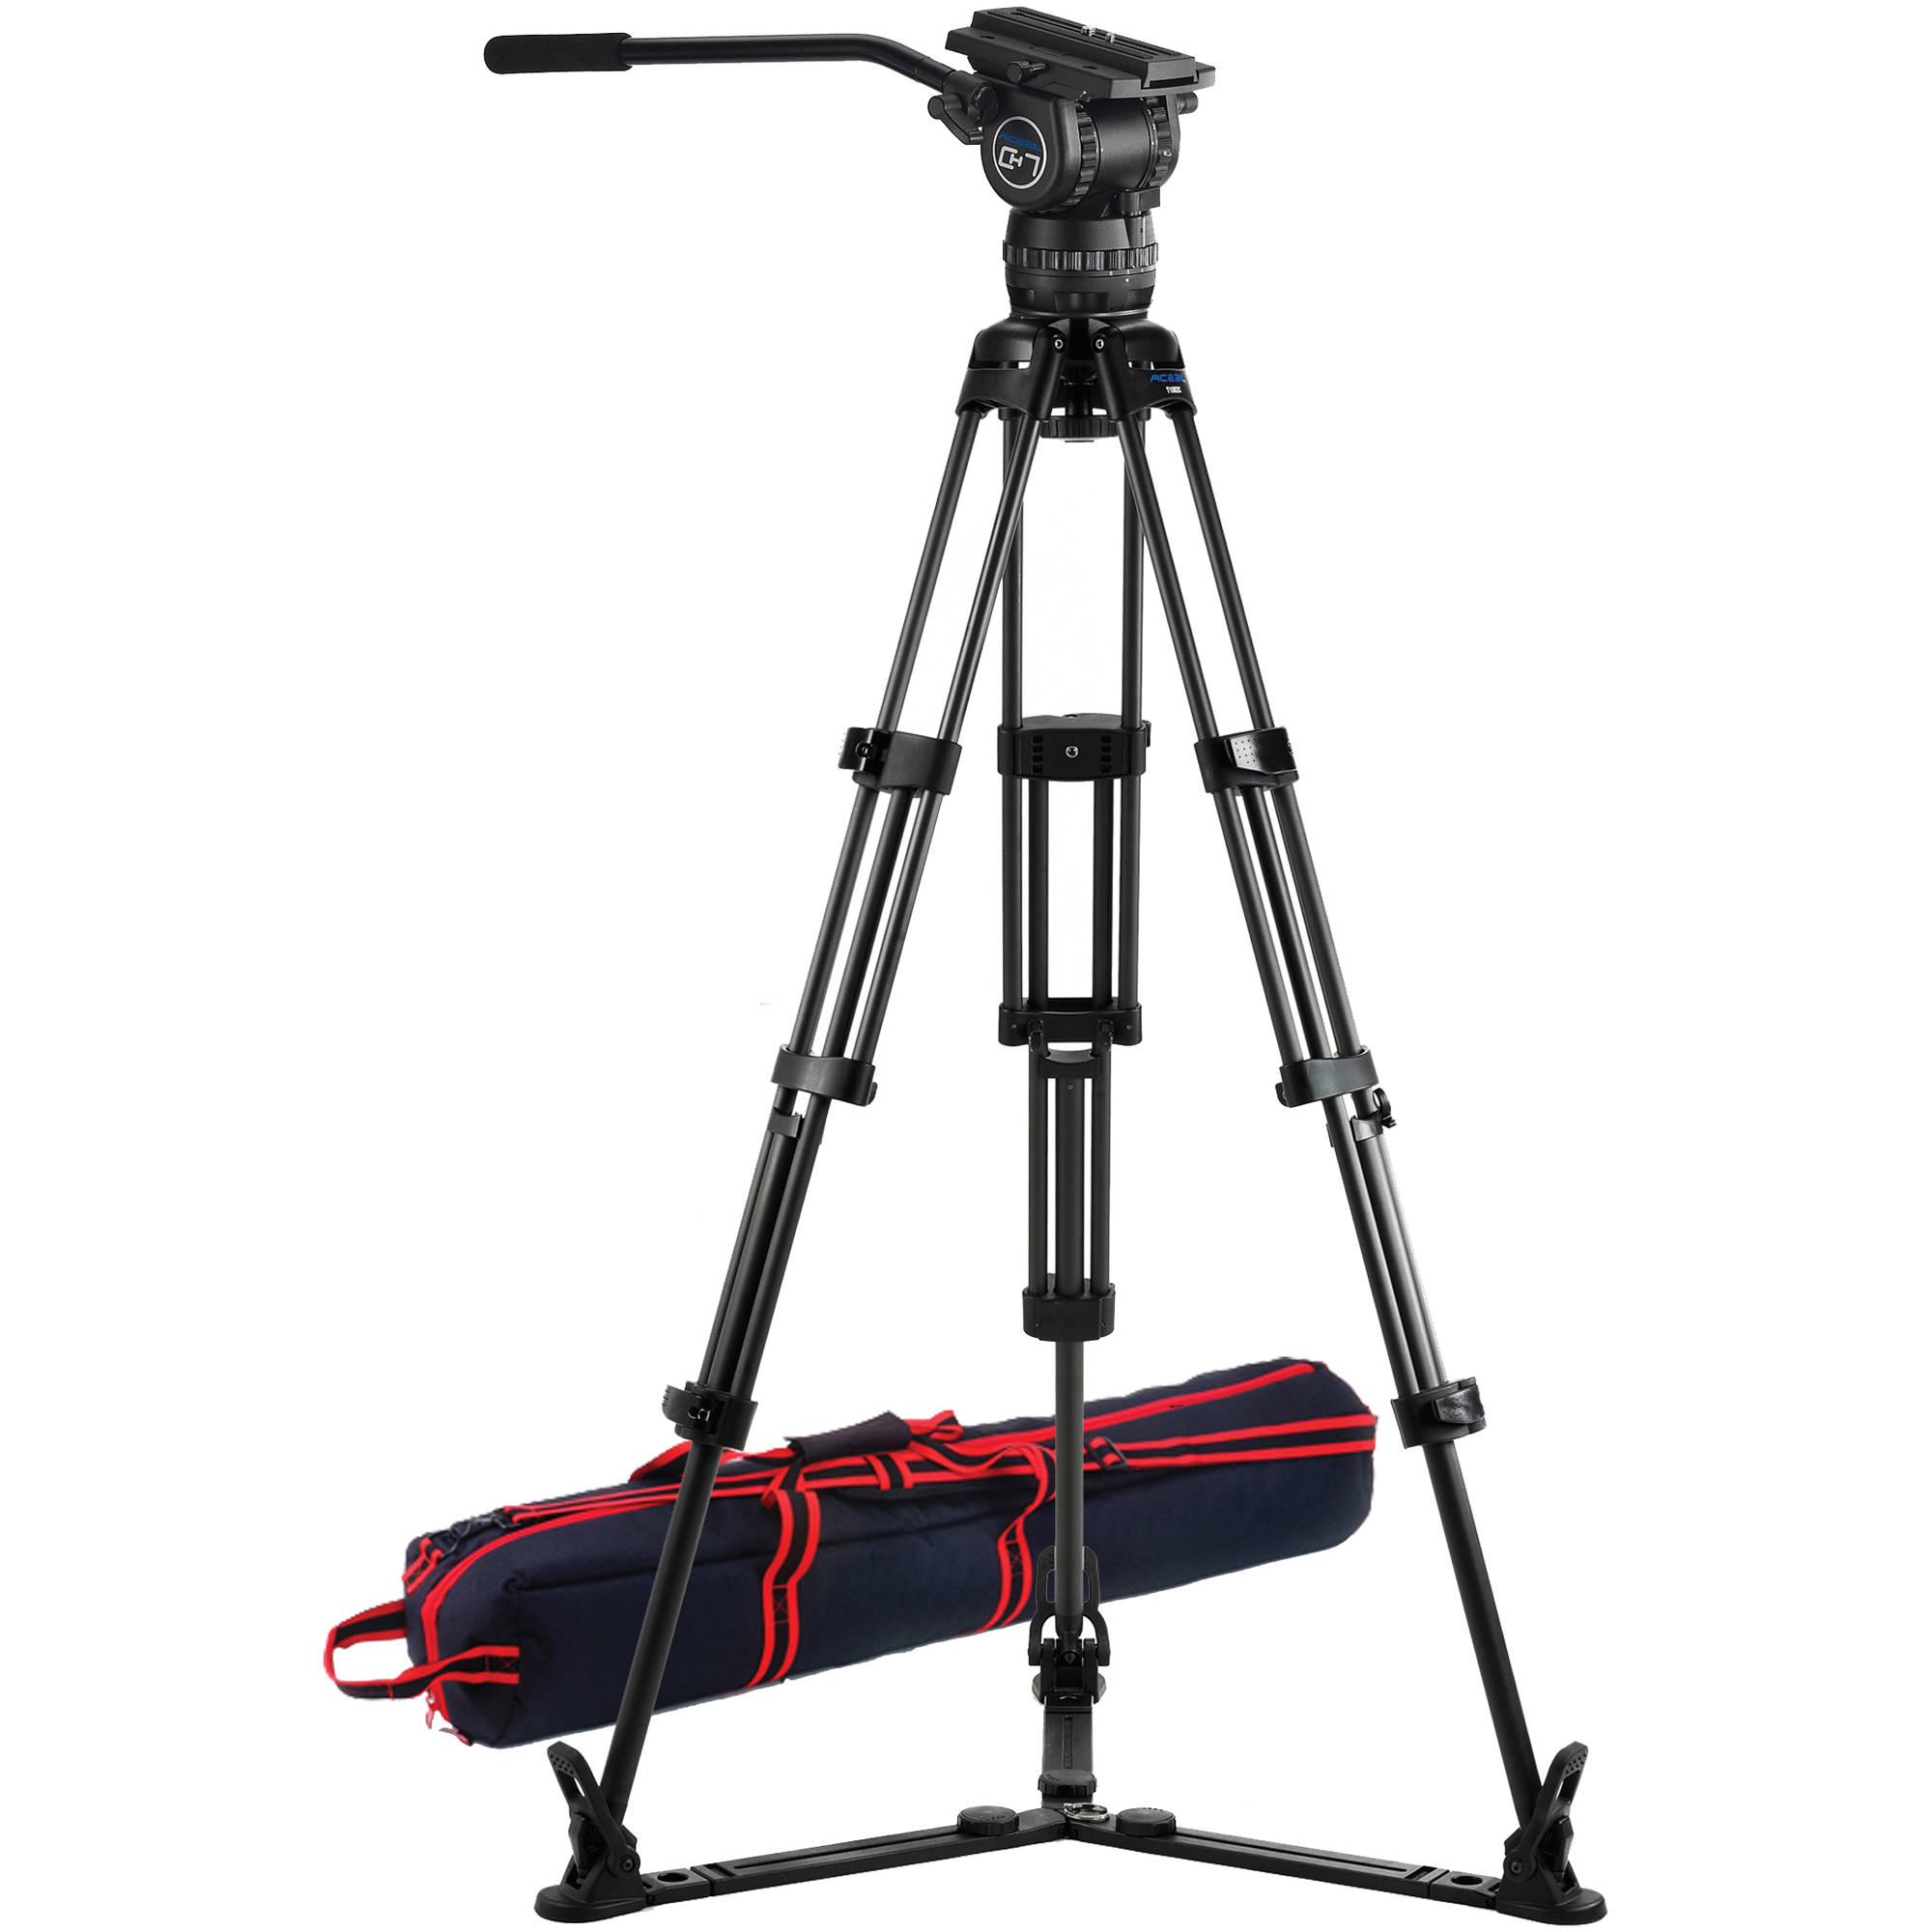 Https C Product 1061827 Reg Pc Camera M Tech 5mp Wb 100 Acebil Cs 782g Professional Tripod System 1062648